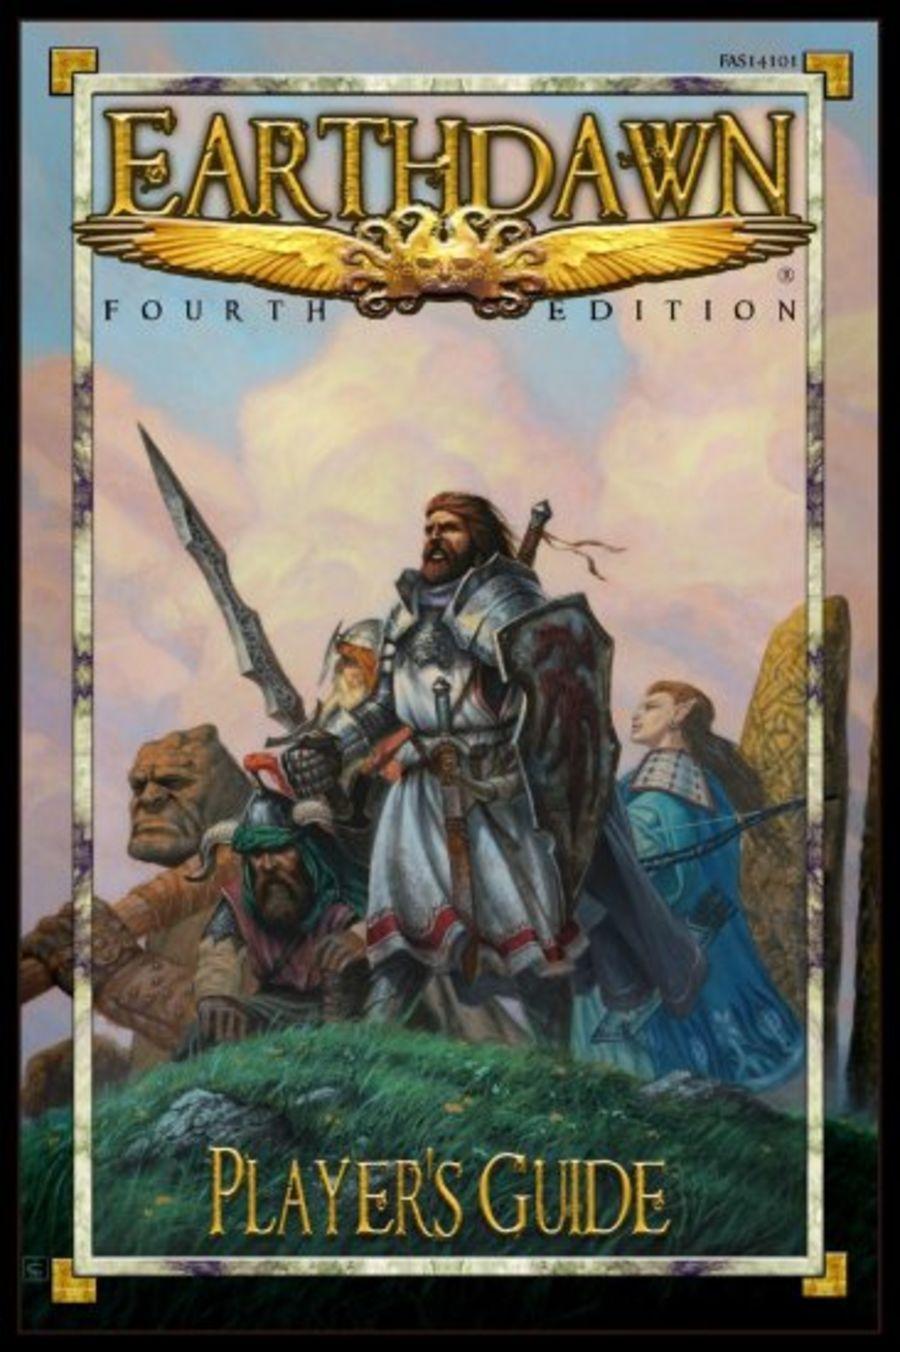 Earthdawn Player's Guide 4th Ed